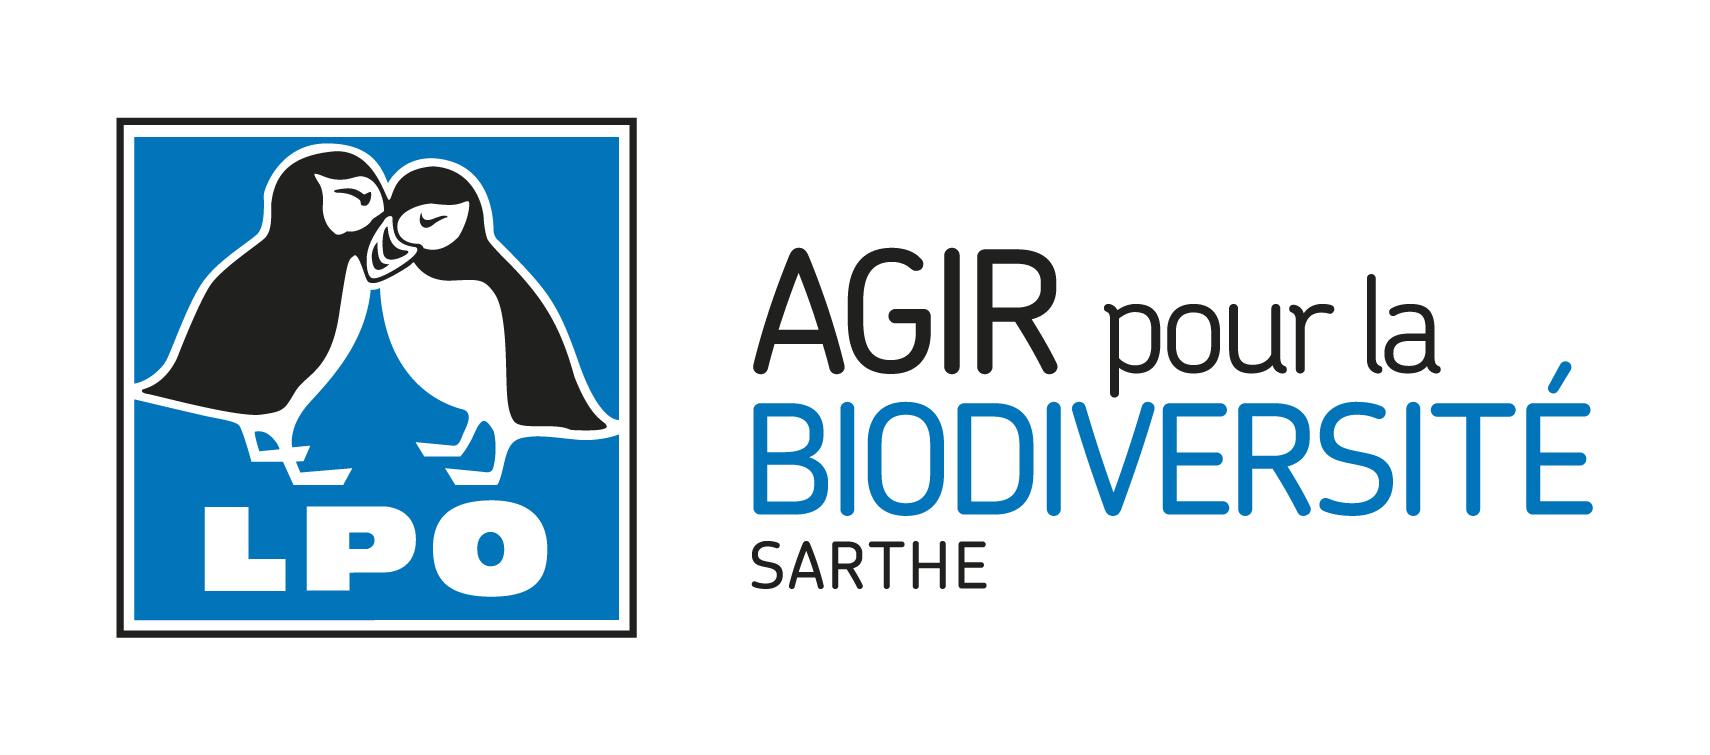 https://cdnfiles1.biolovision.net/www.faune-maine.org/userfiles/LPOAgirpourlabioSarthe.png